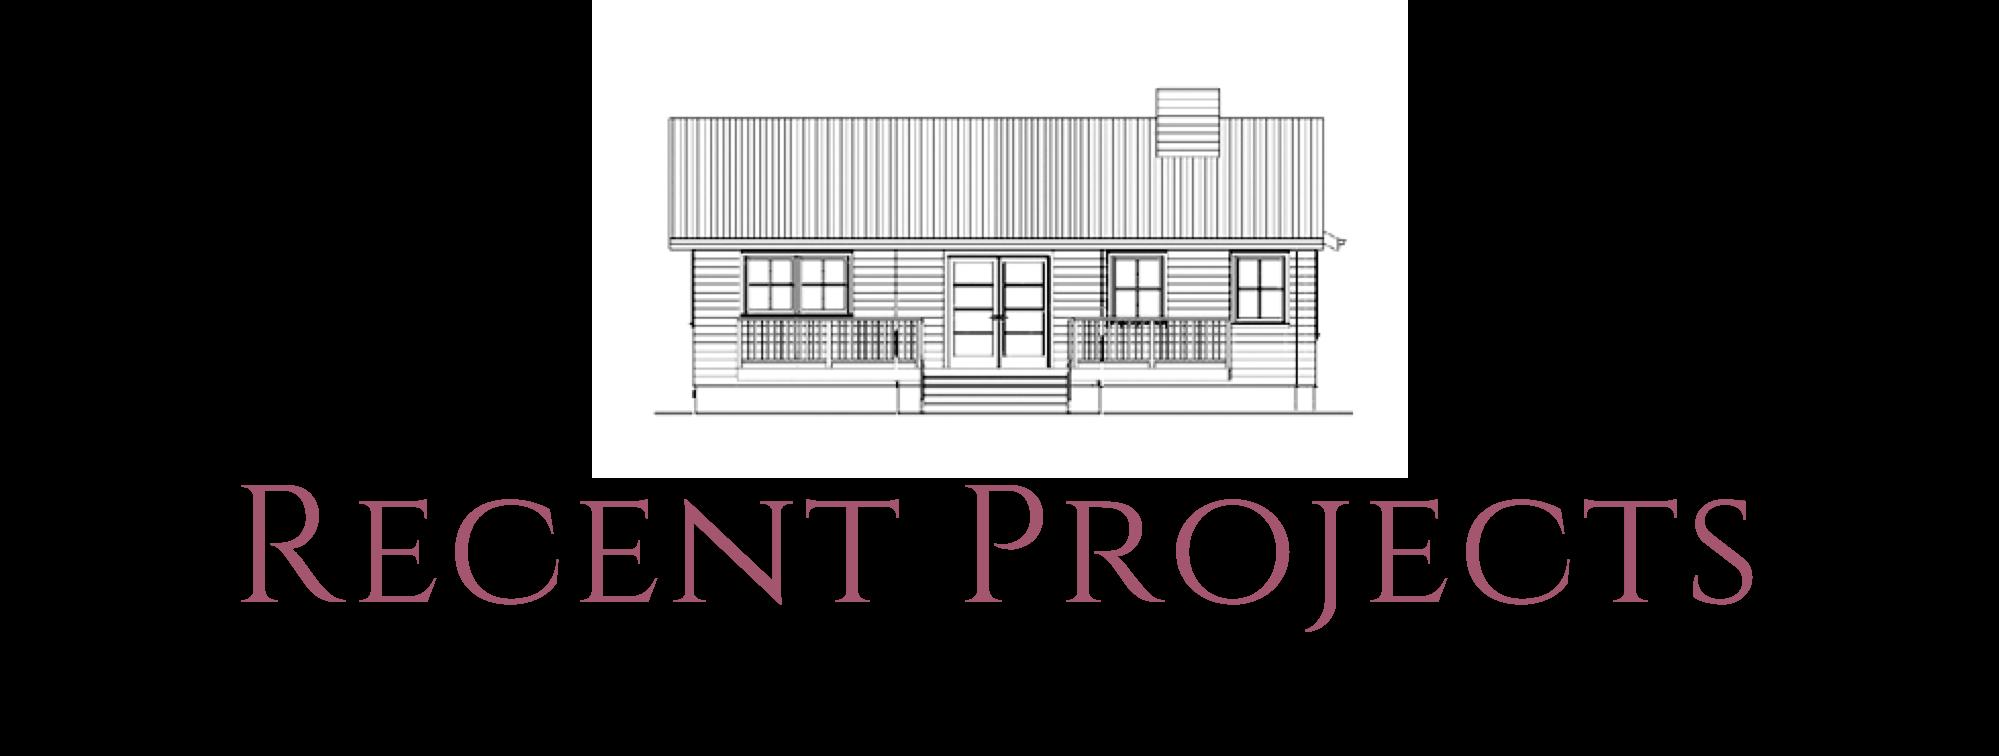 Pennard_Developments_Recent_Projects